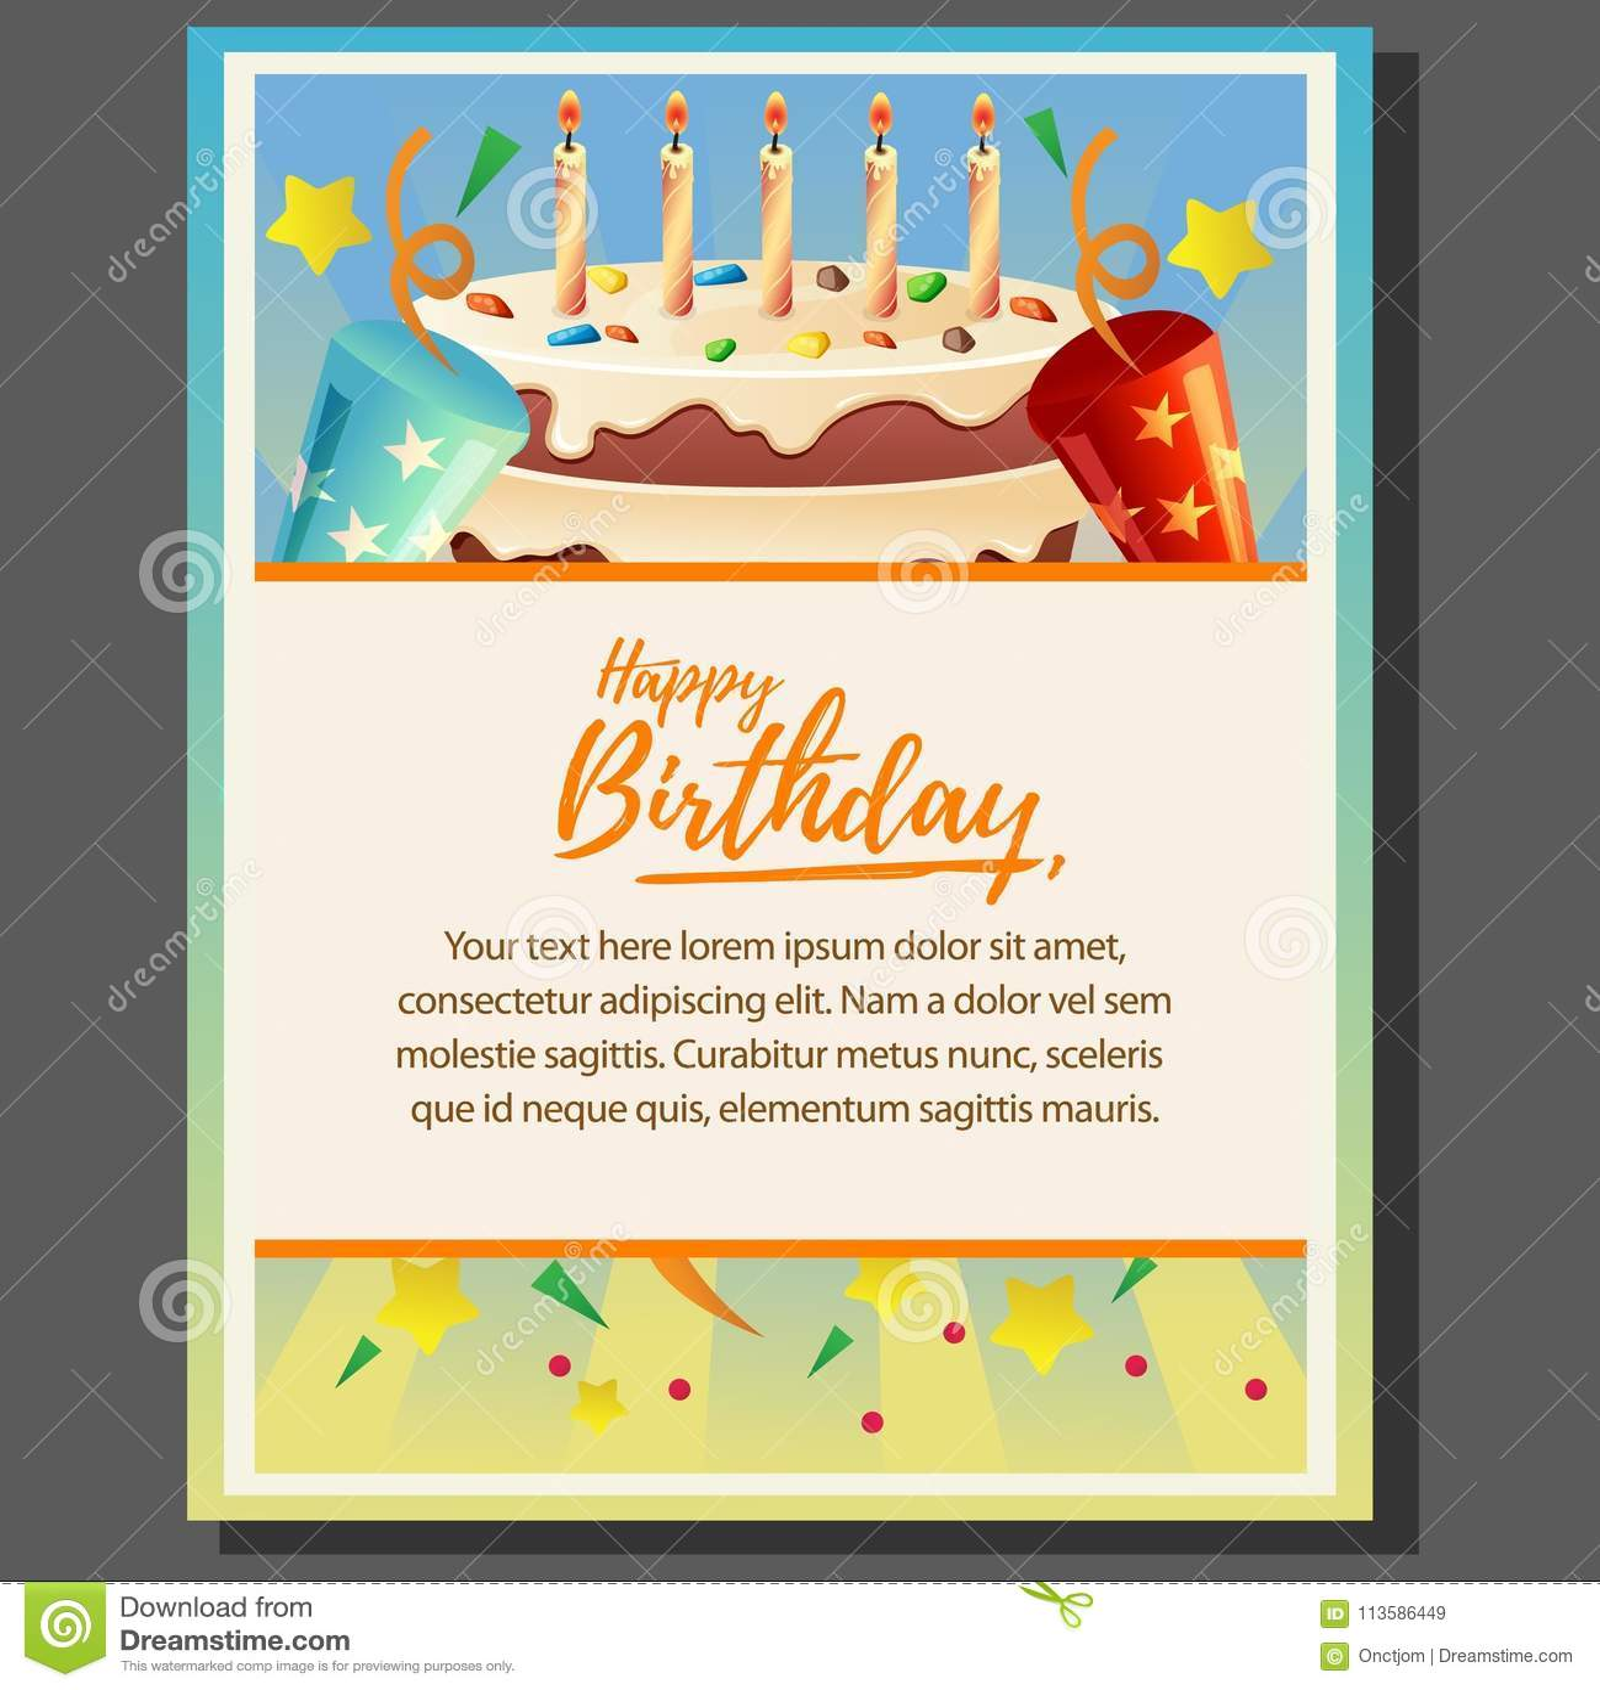 Happy Birthday Theme Poster With Big Cake Stock Vector